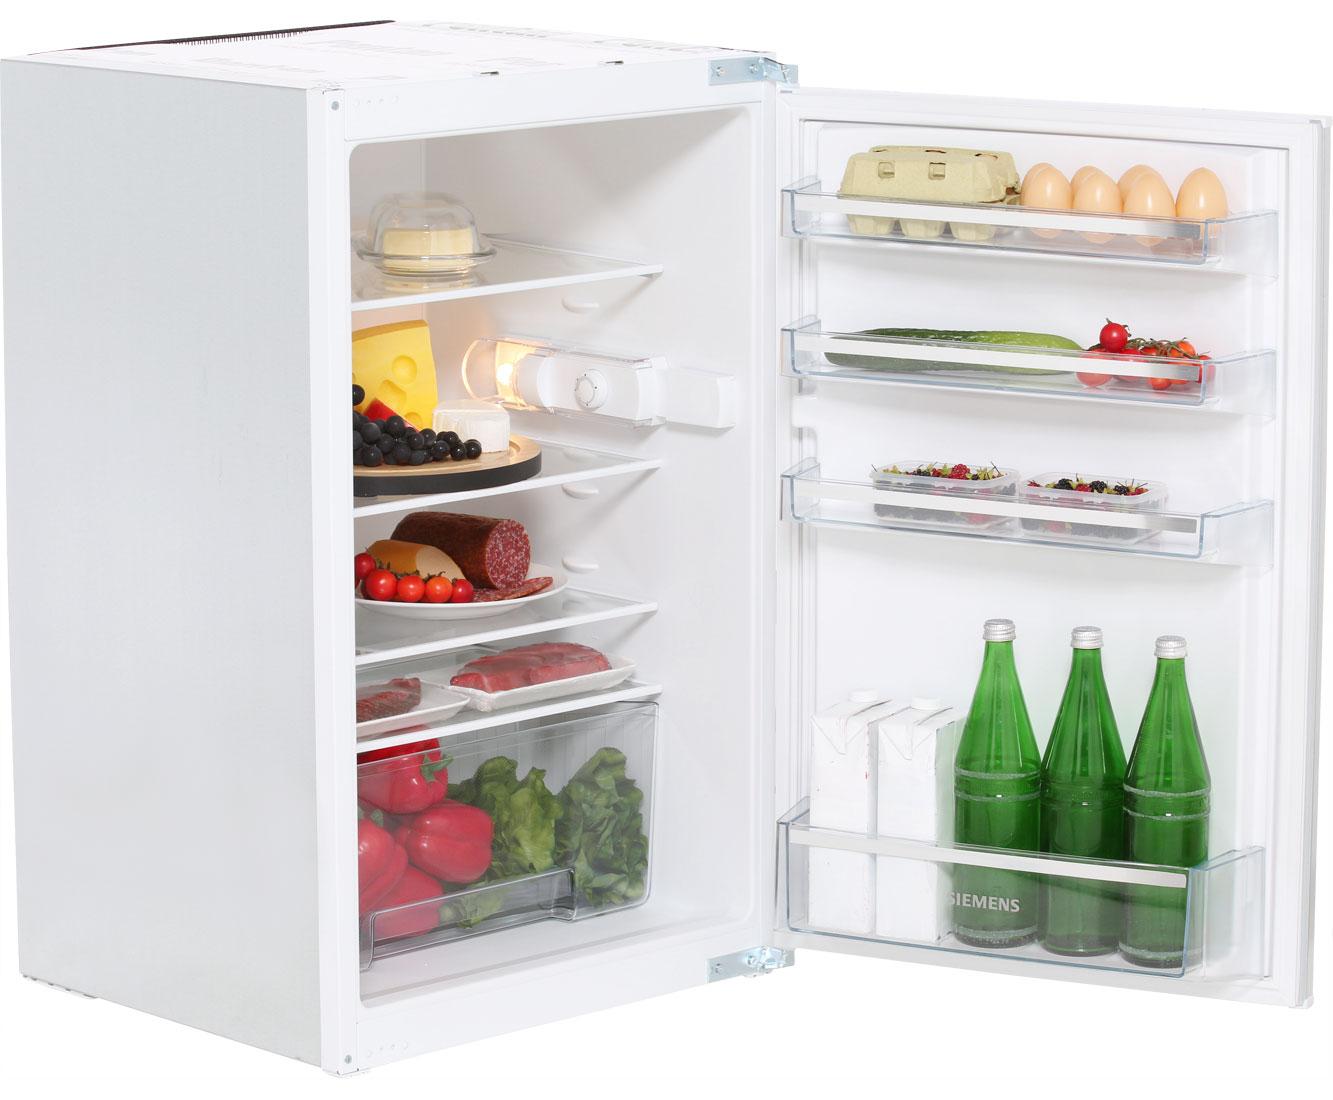 Siemens Kühlschrank Display : Siemens ki raf a mediamarkt